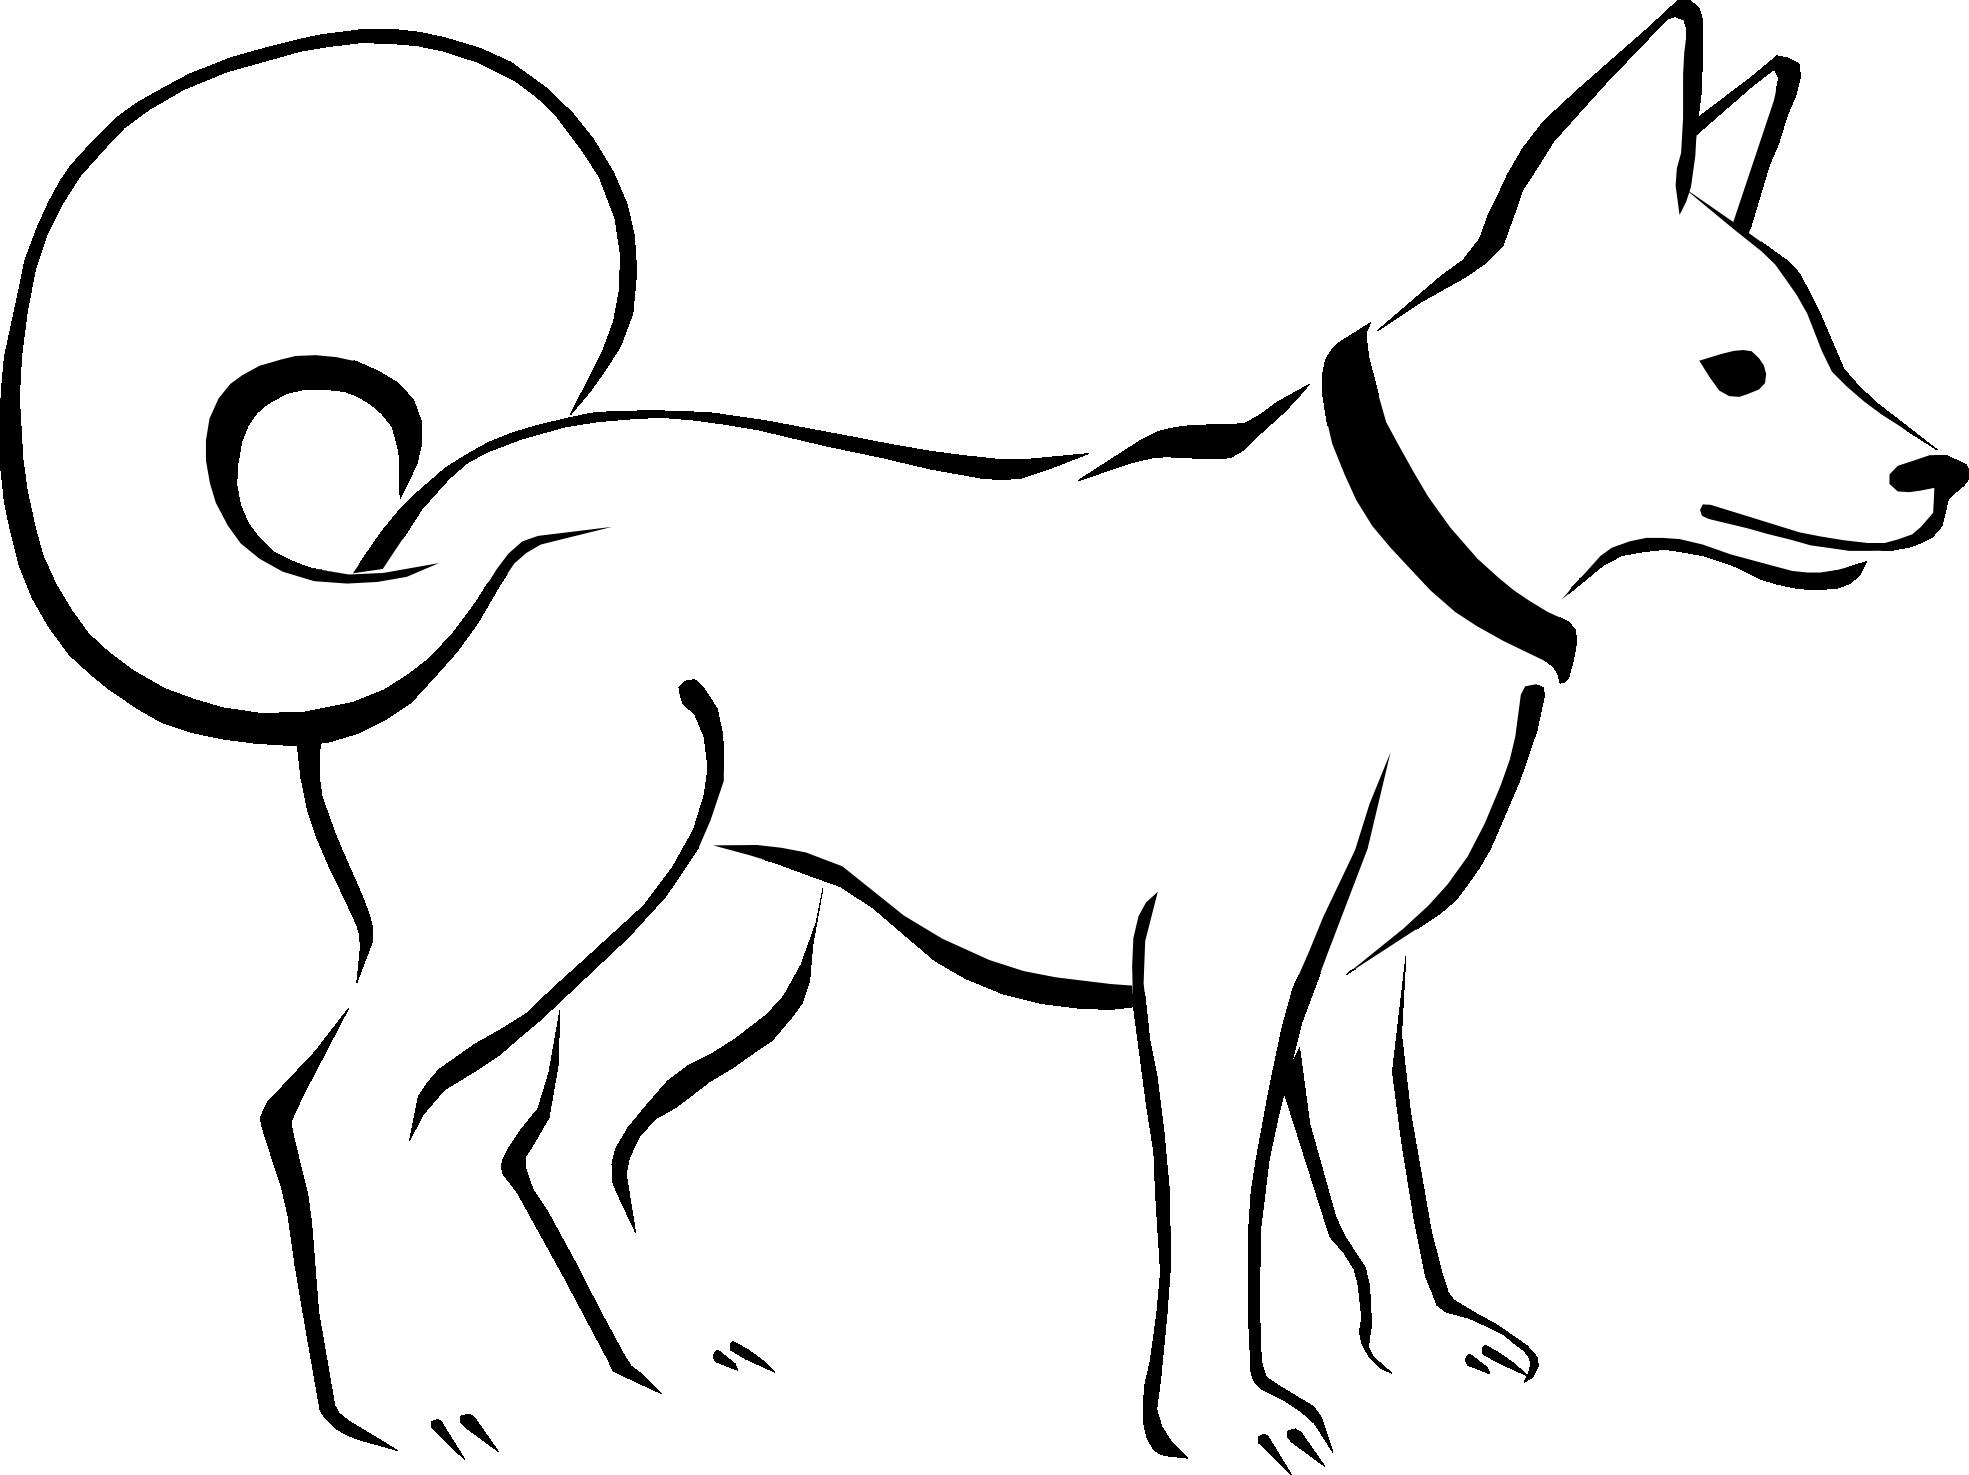 flip flops clipart black and white